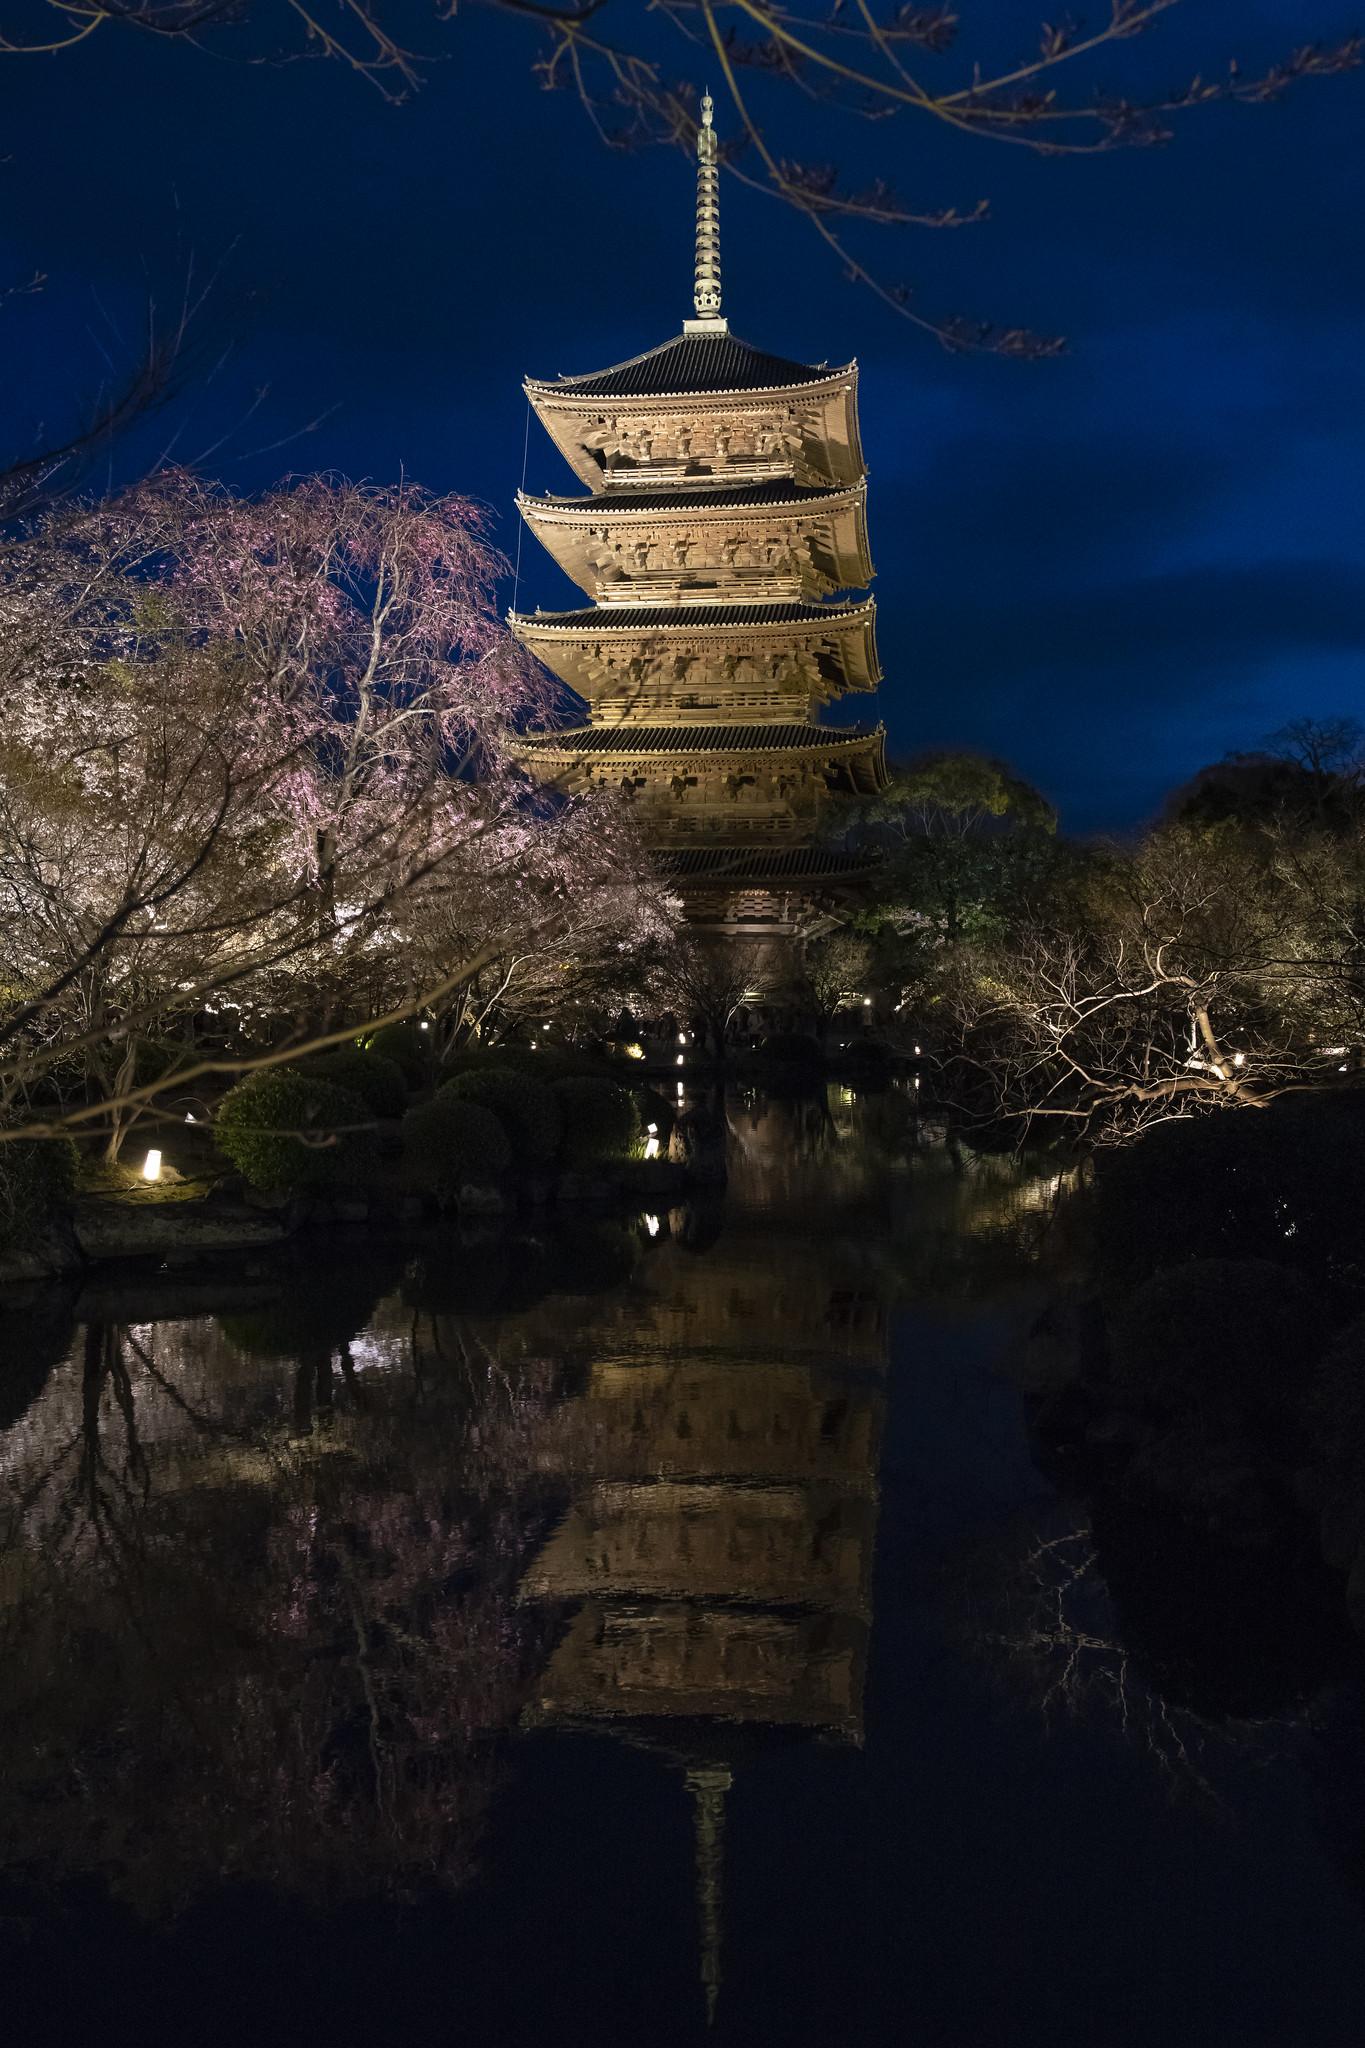 Toji Pagoda - Kyoto